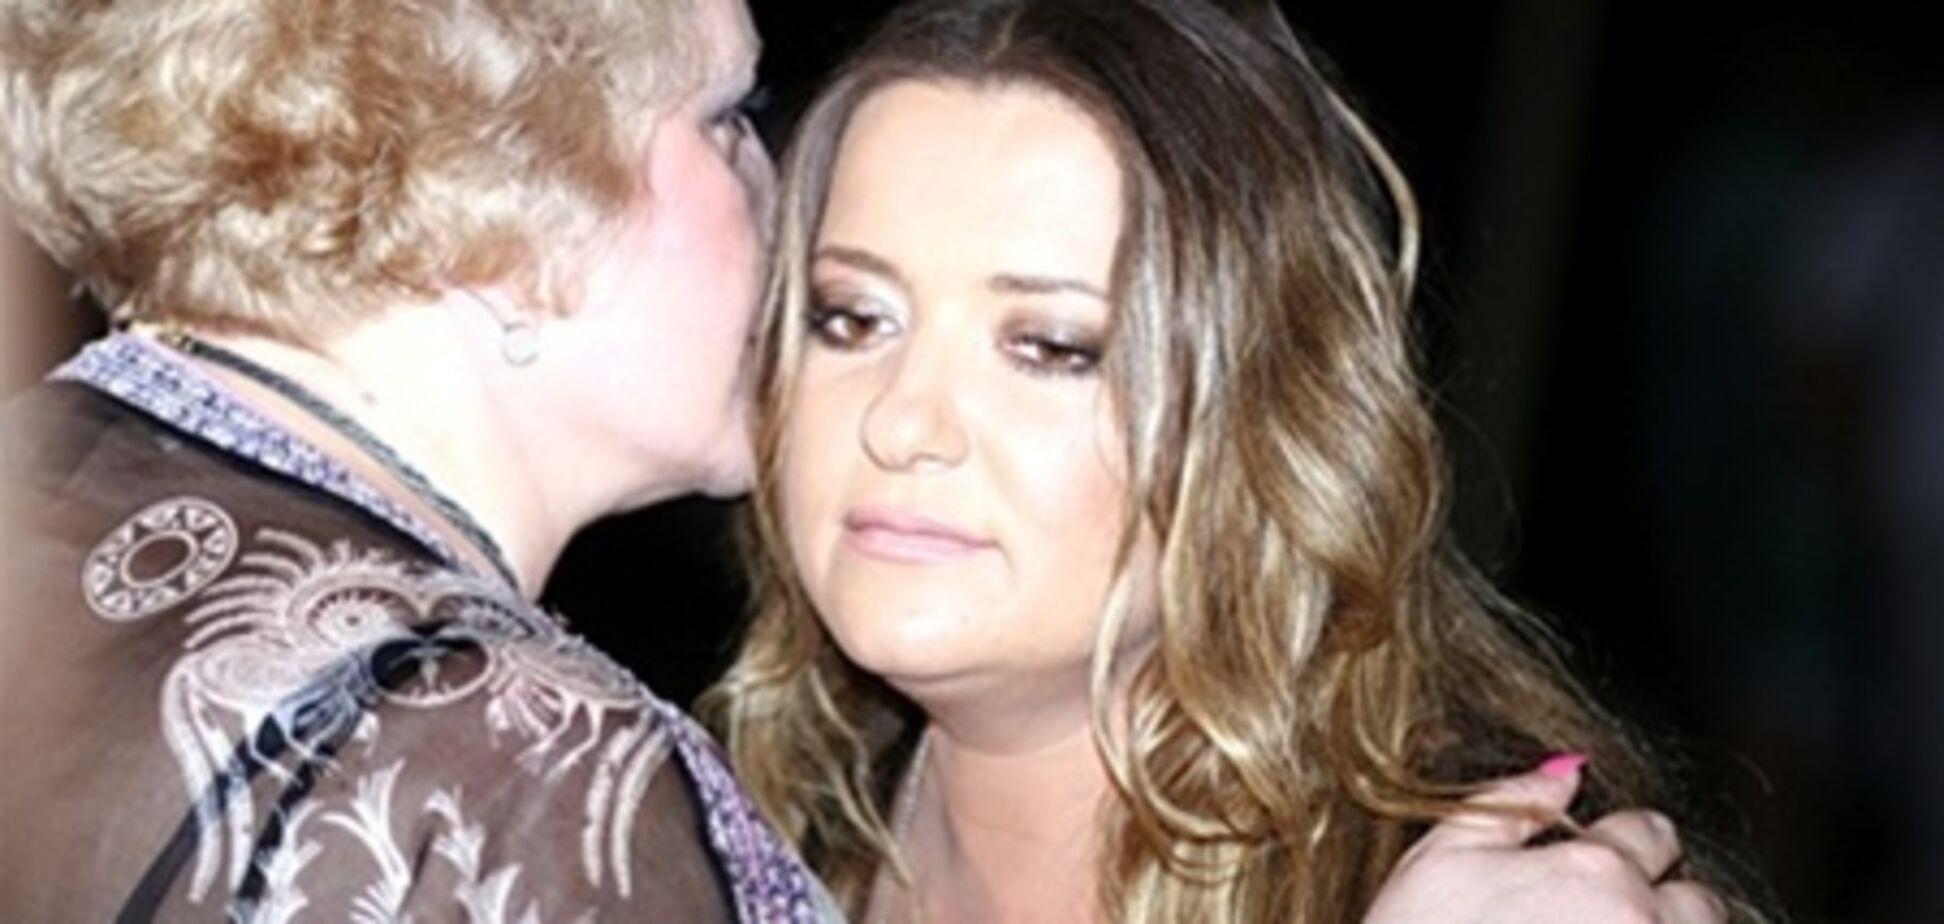 Могилевська засмутилася через весілля екс-коханця